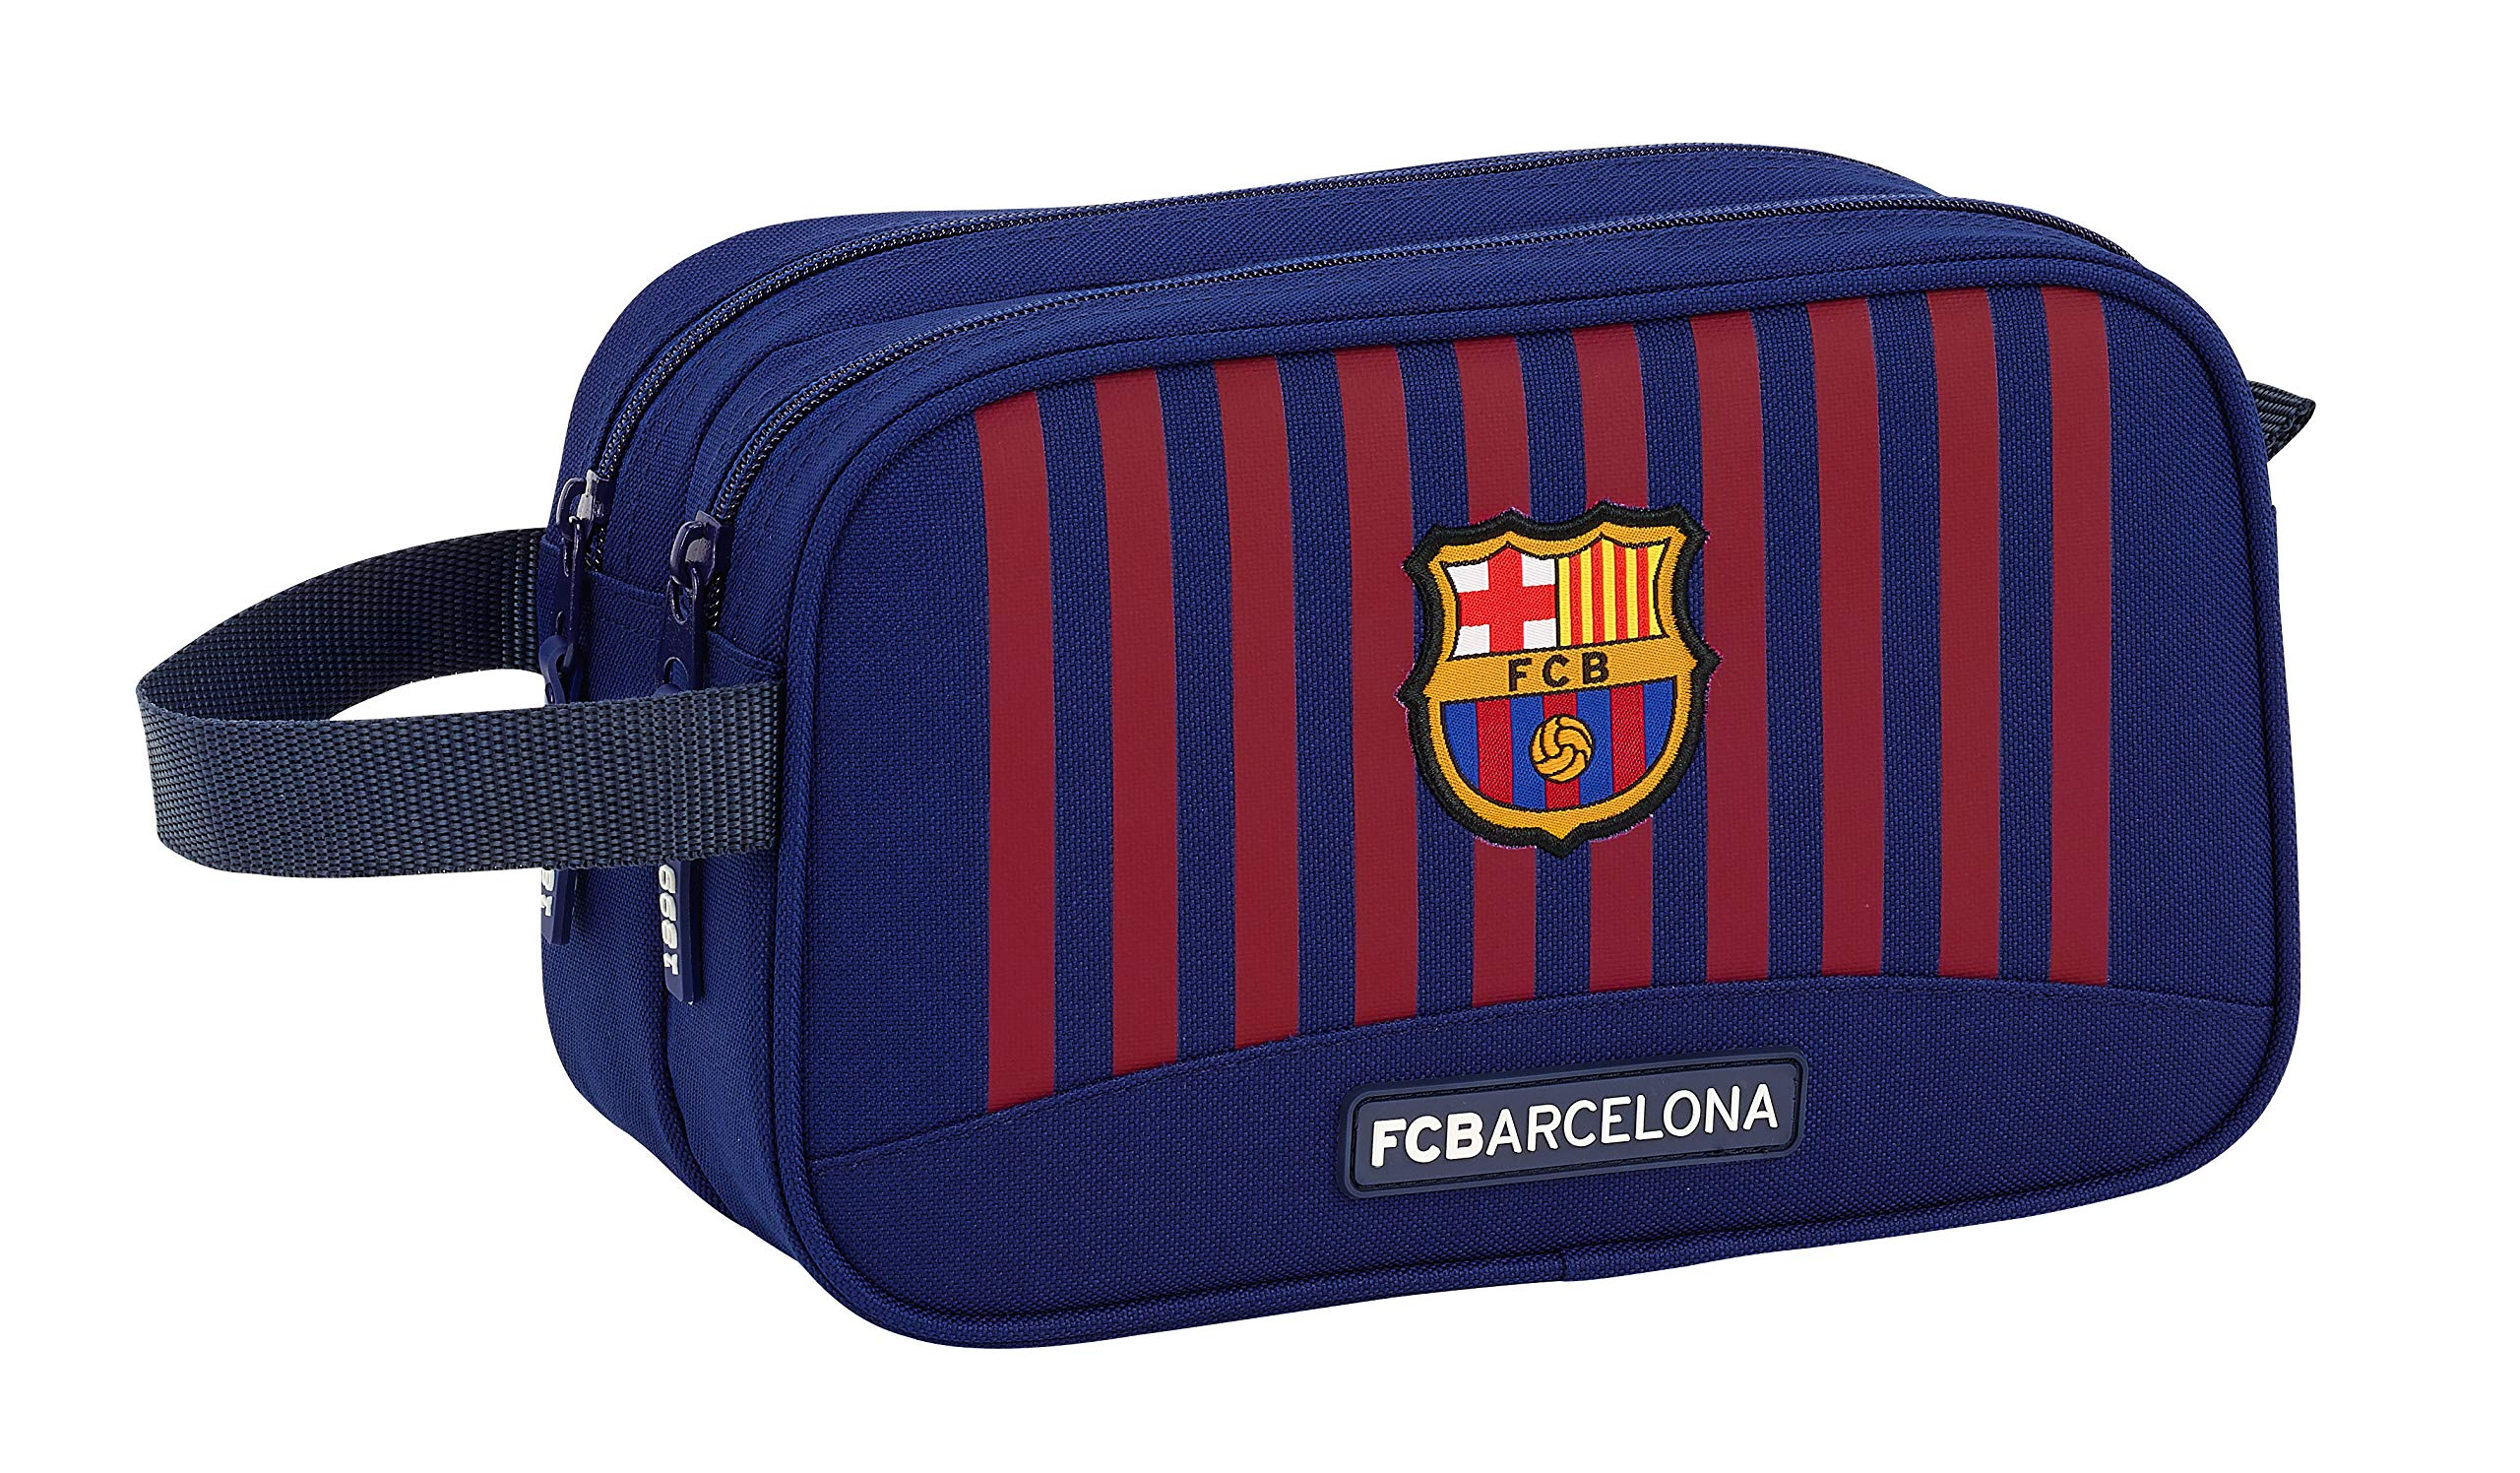 FCB FC Barcelona, 26 cm, Azul 811829518 2018 Bolsa de Aseo, Unisex